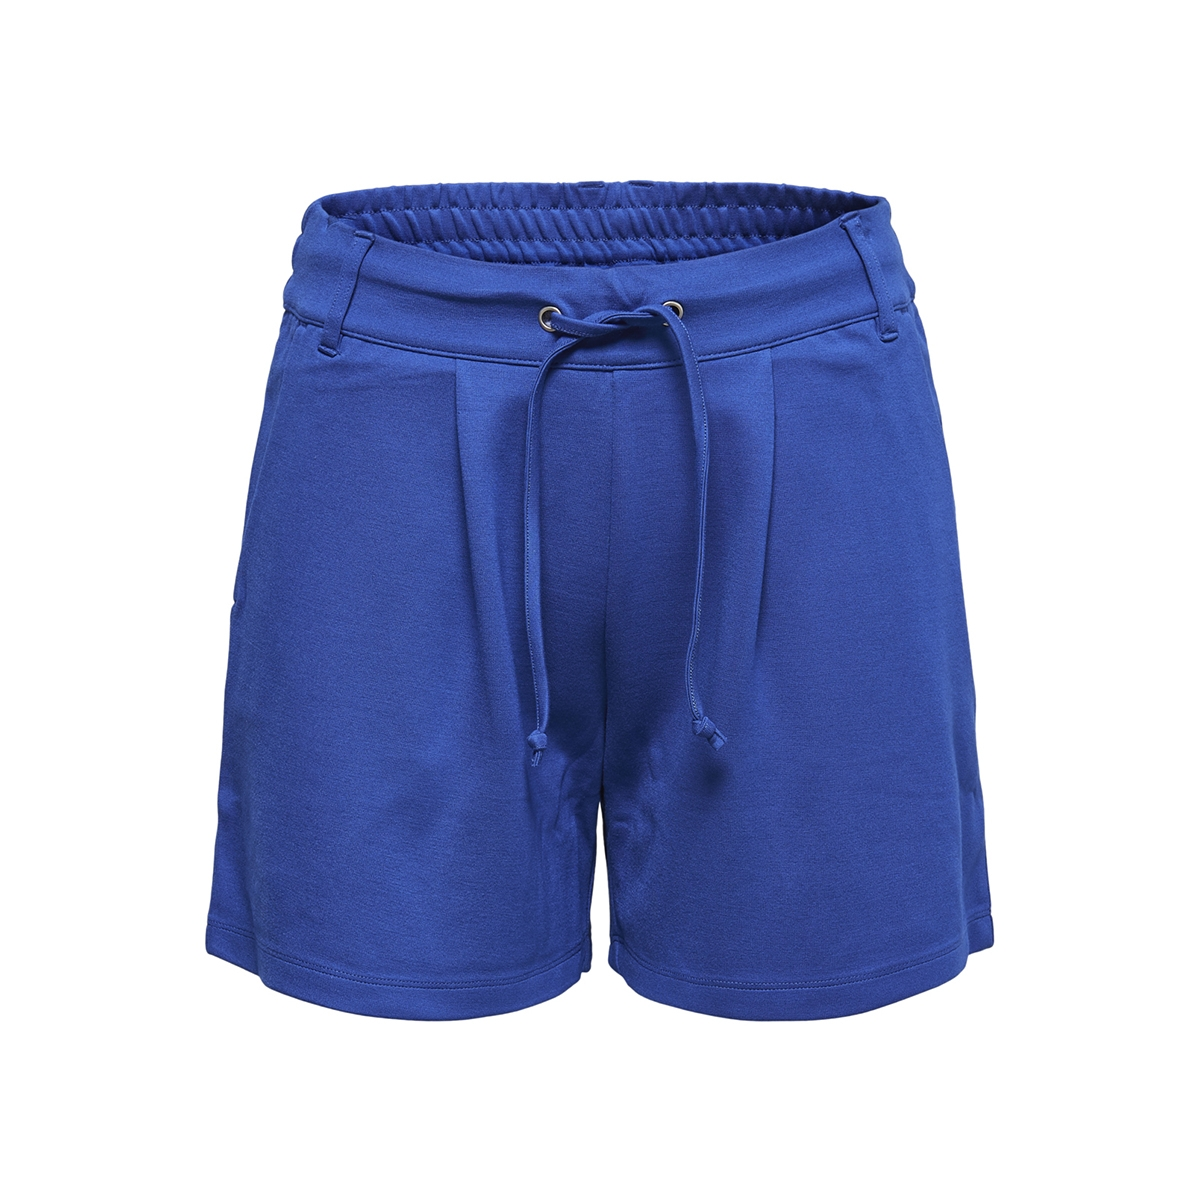 jdypretty shorts noos jrs rpt1 15147052 jacqueline de yong korte broek surf the web